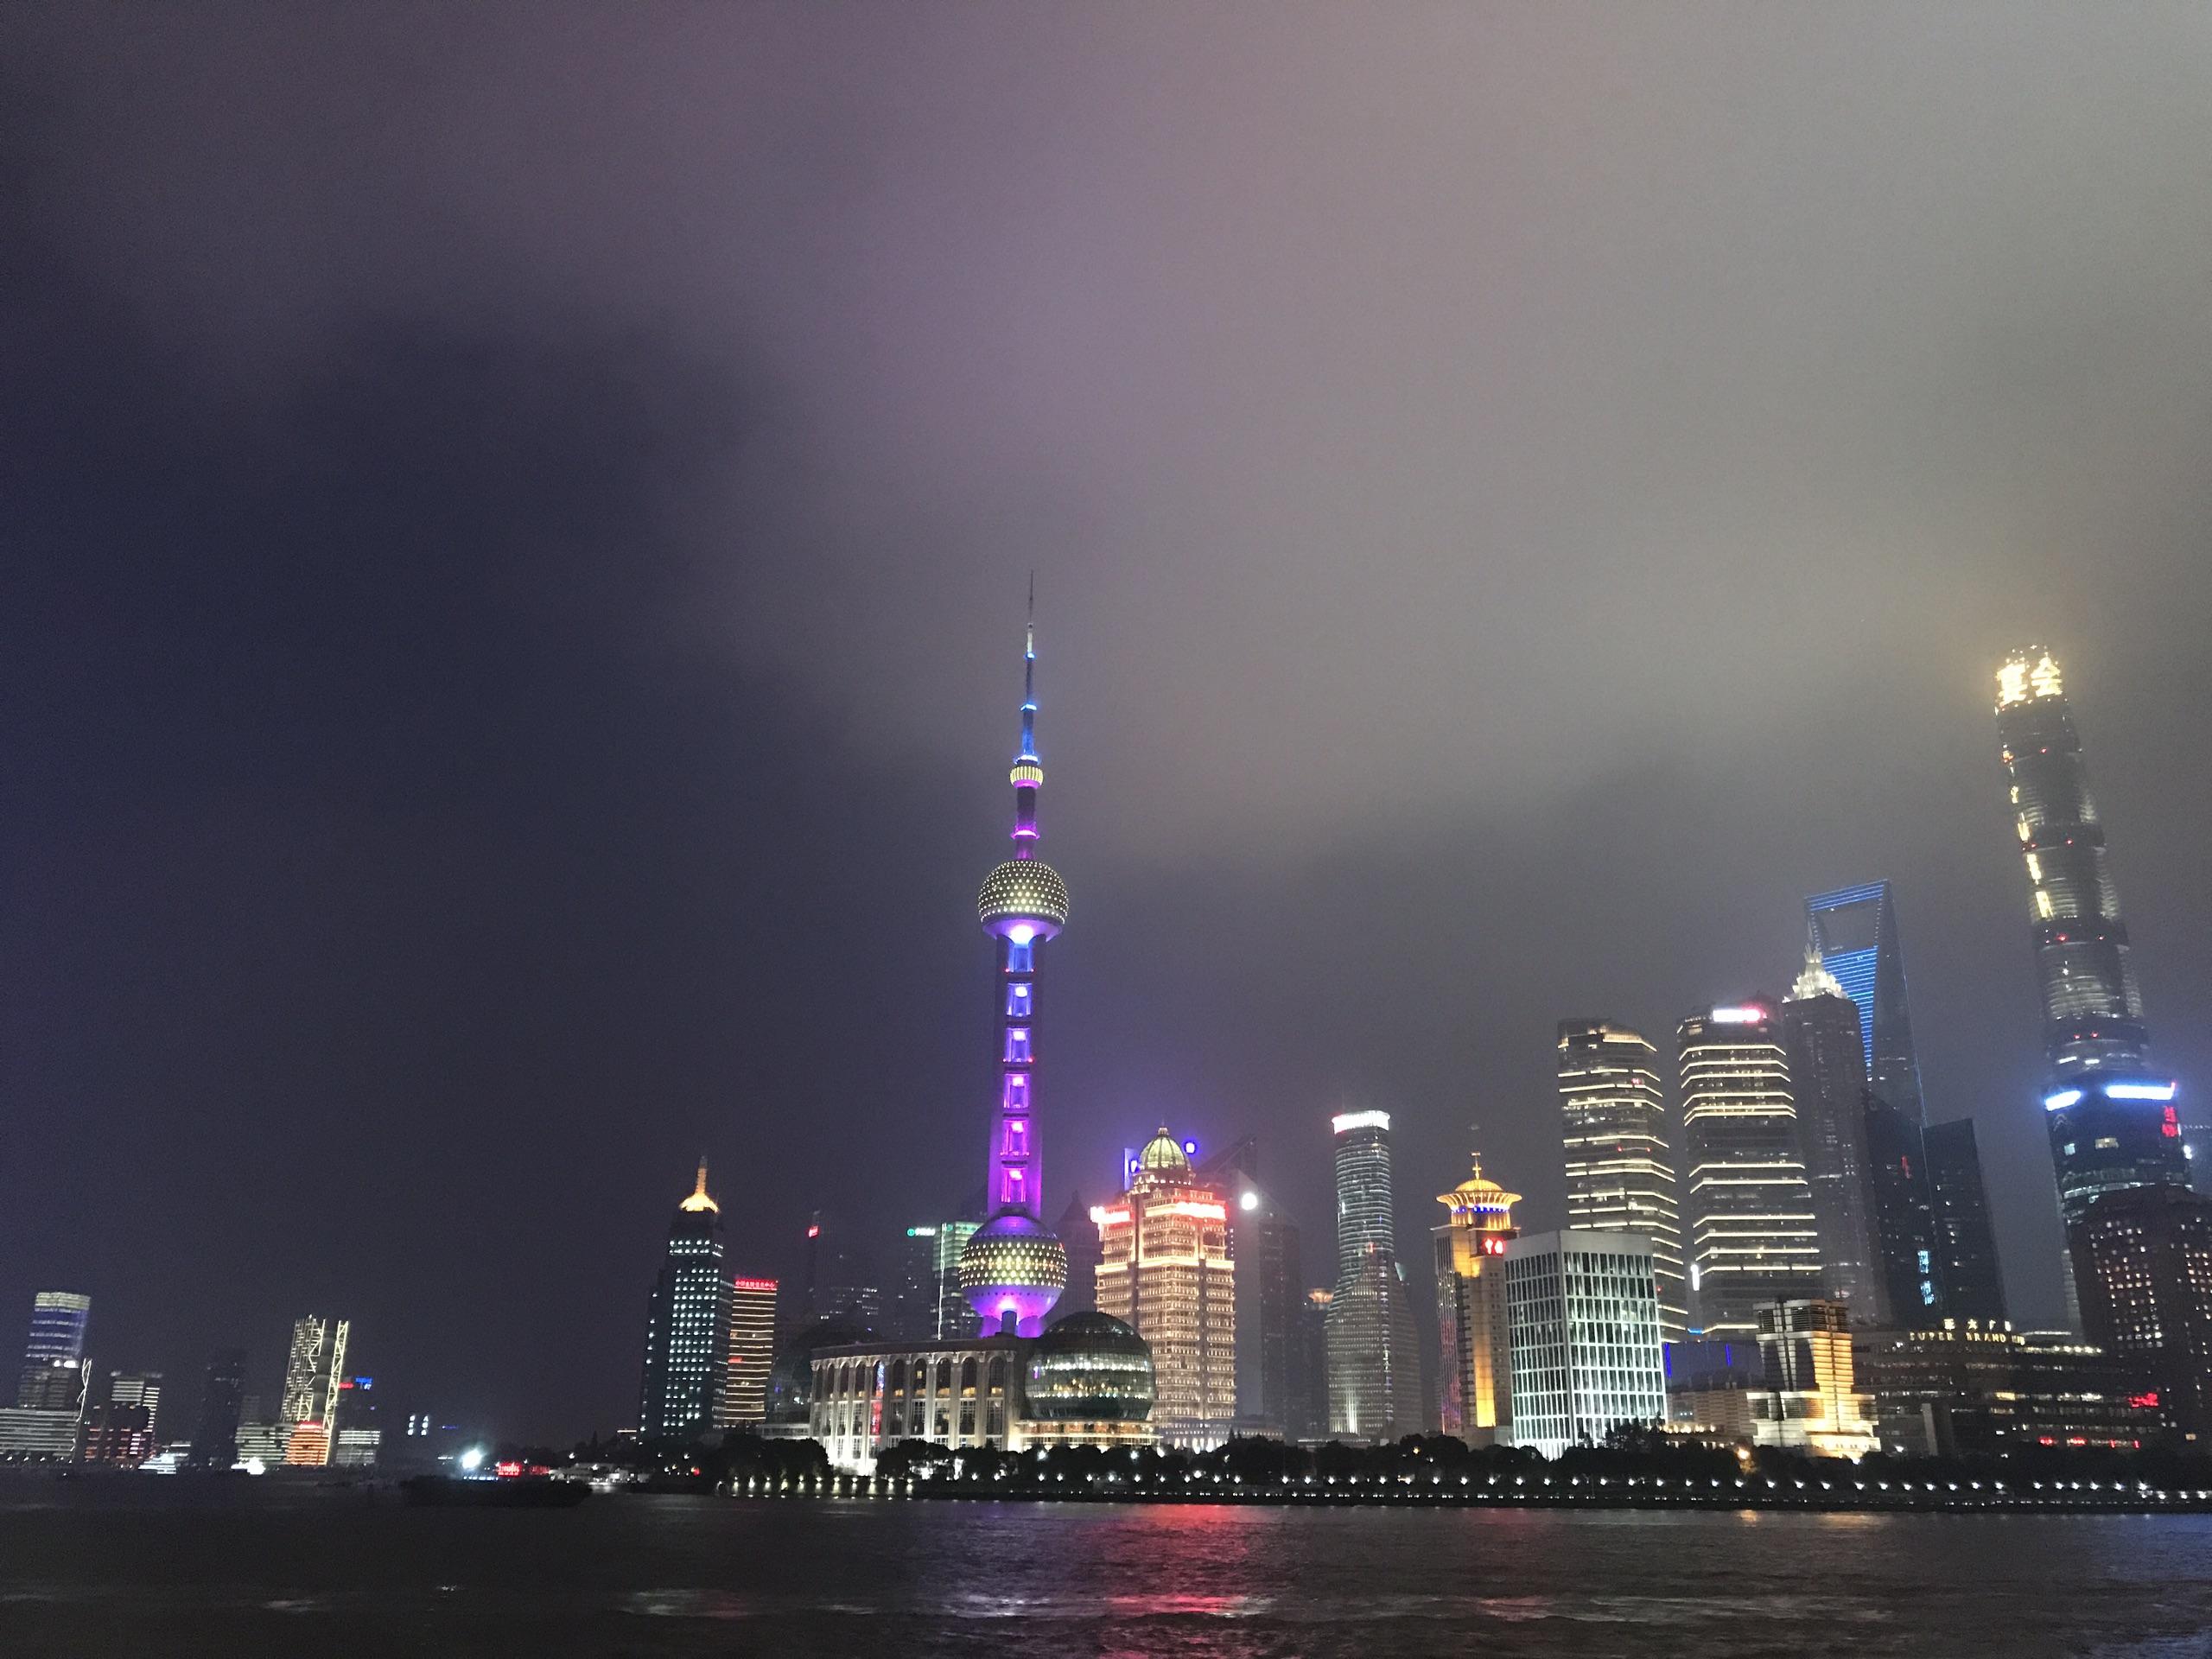 ShangHai Oriental Pearl Tower